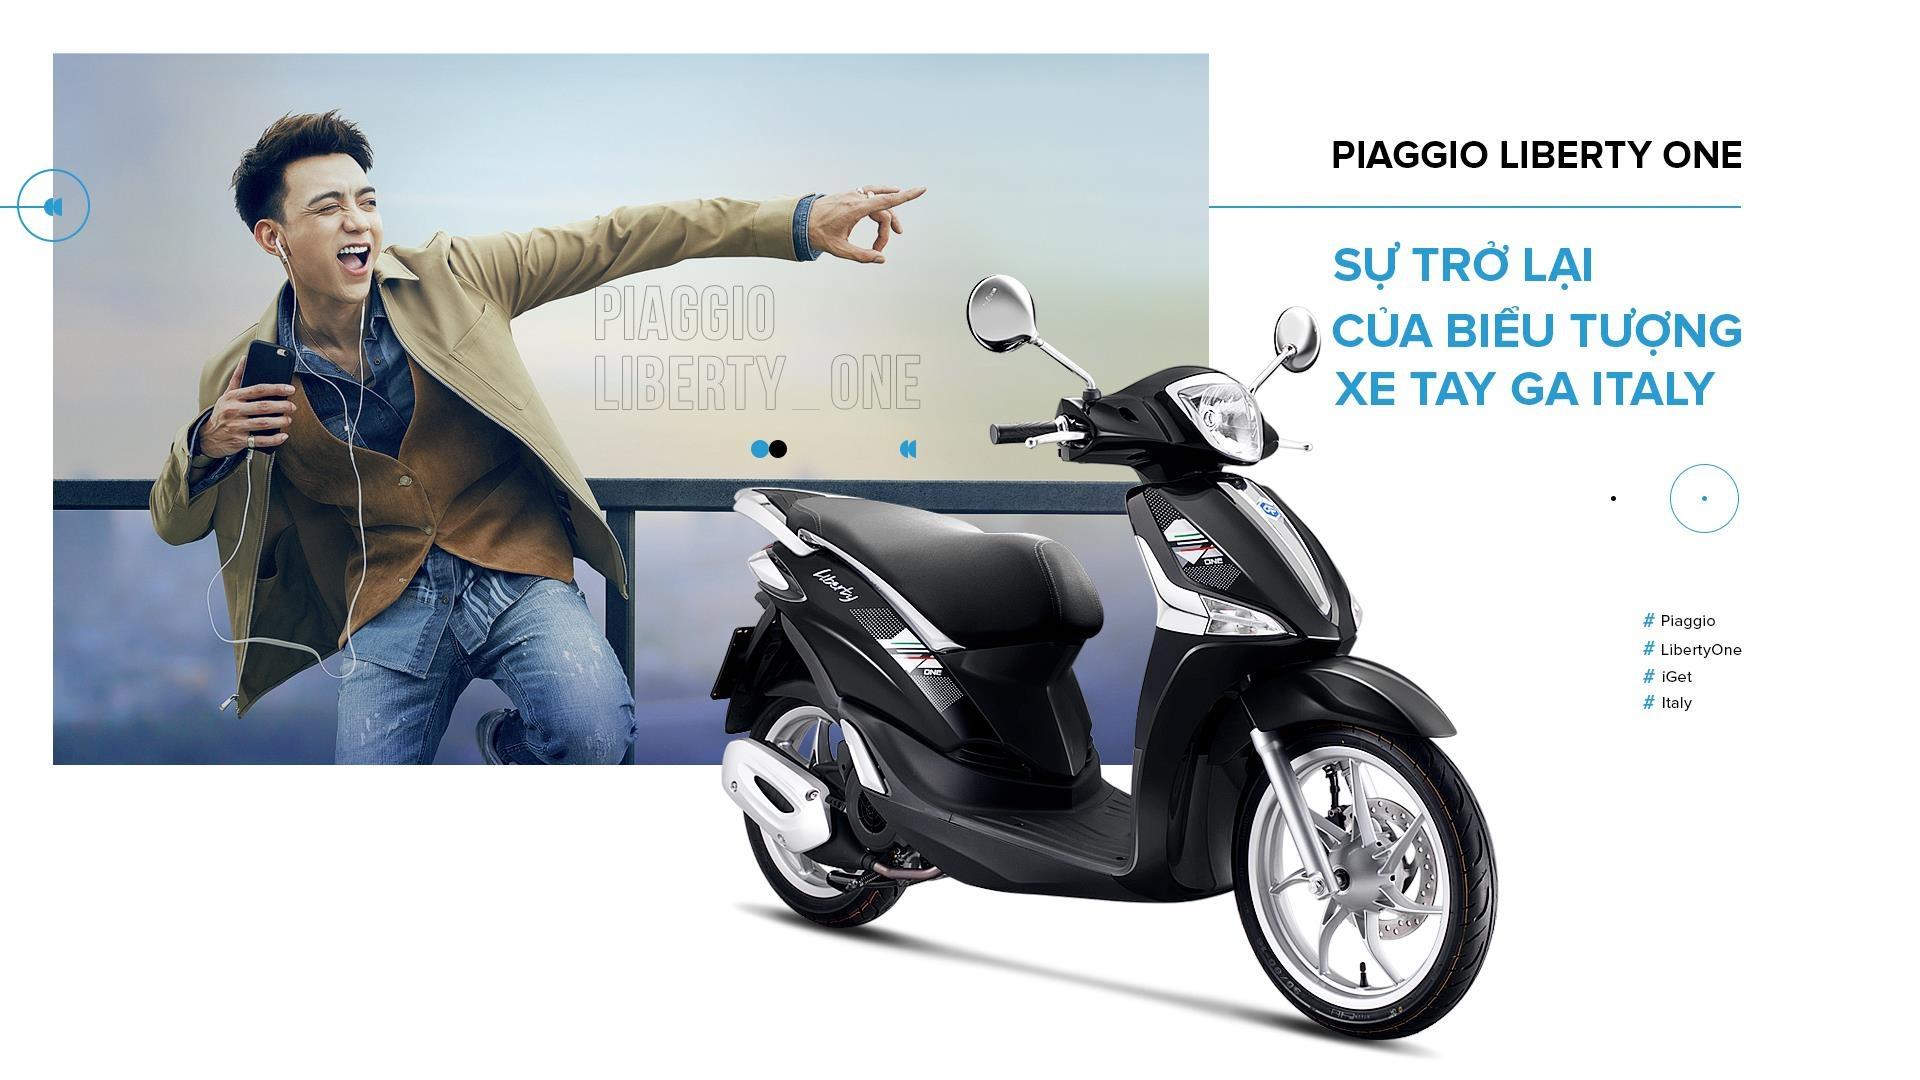 Piaggio Liberty One - su tro lai cua bieu tuong xe tay ga Italy hinh anh 2